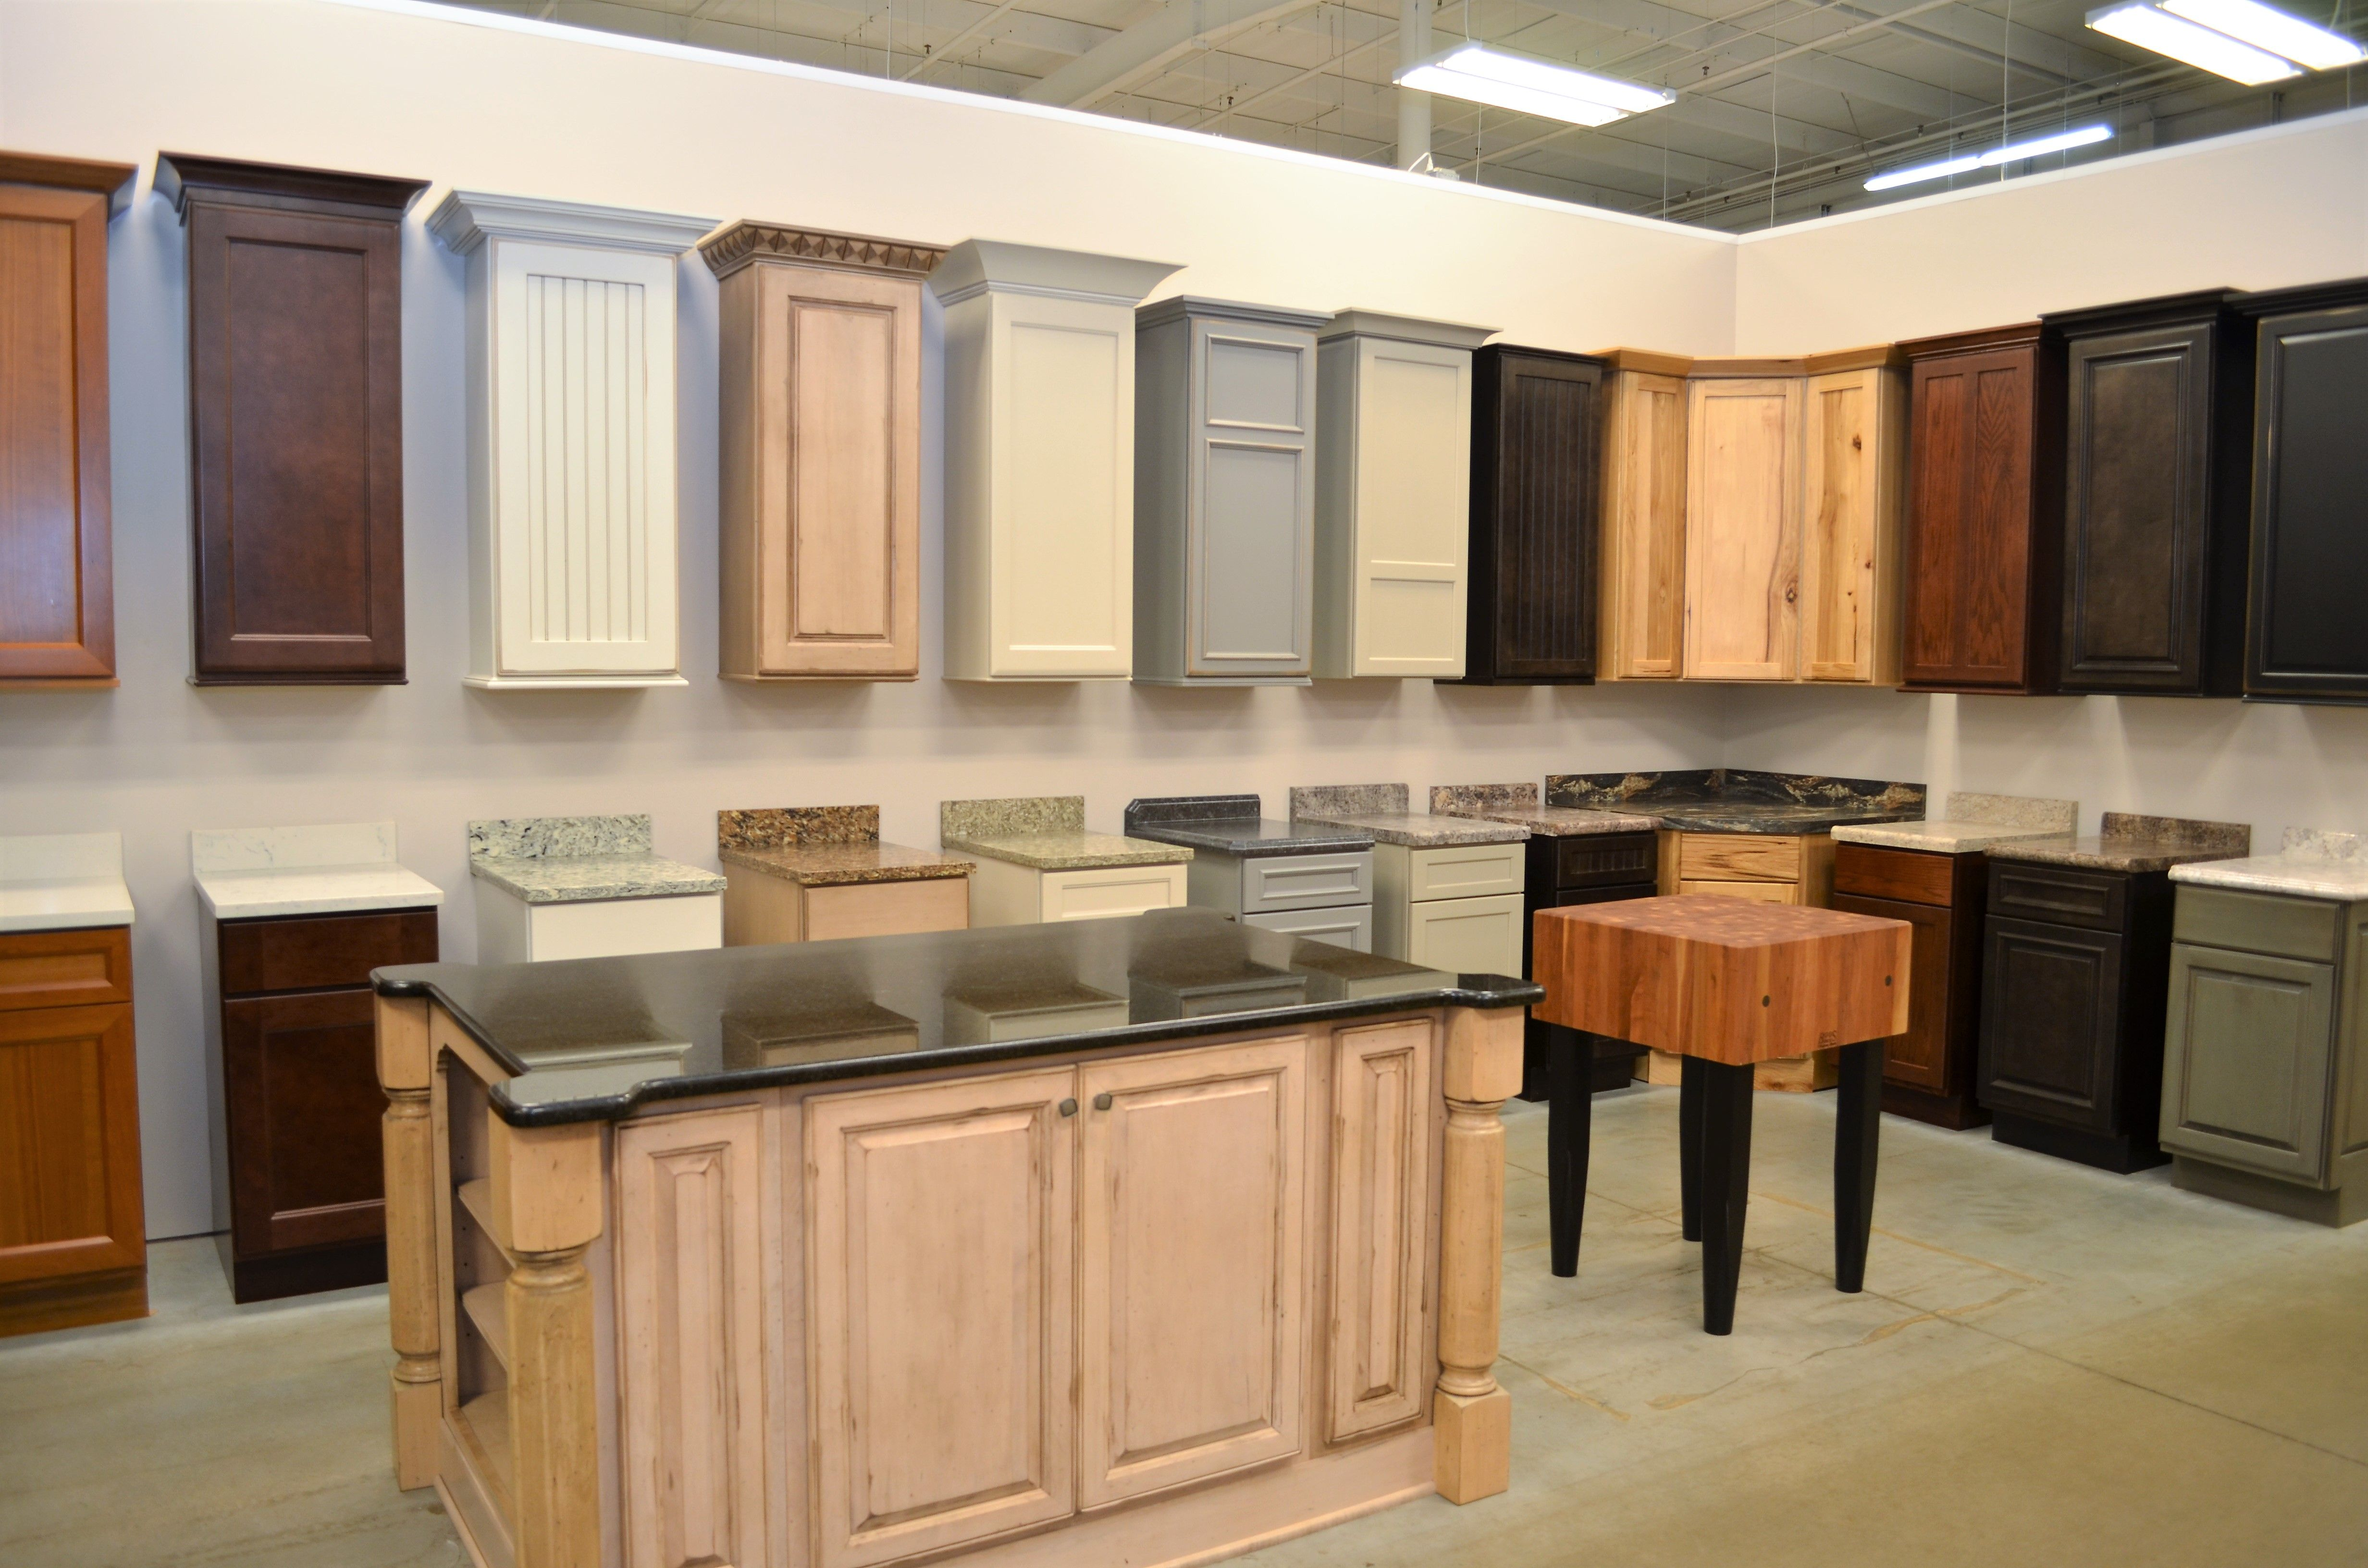 Bailey S Cabinet Showroom Cabinet Manufacturers Cabinet Countertops